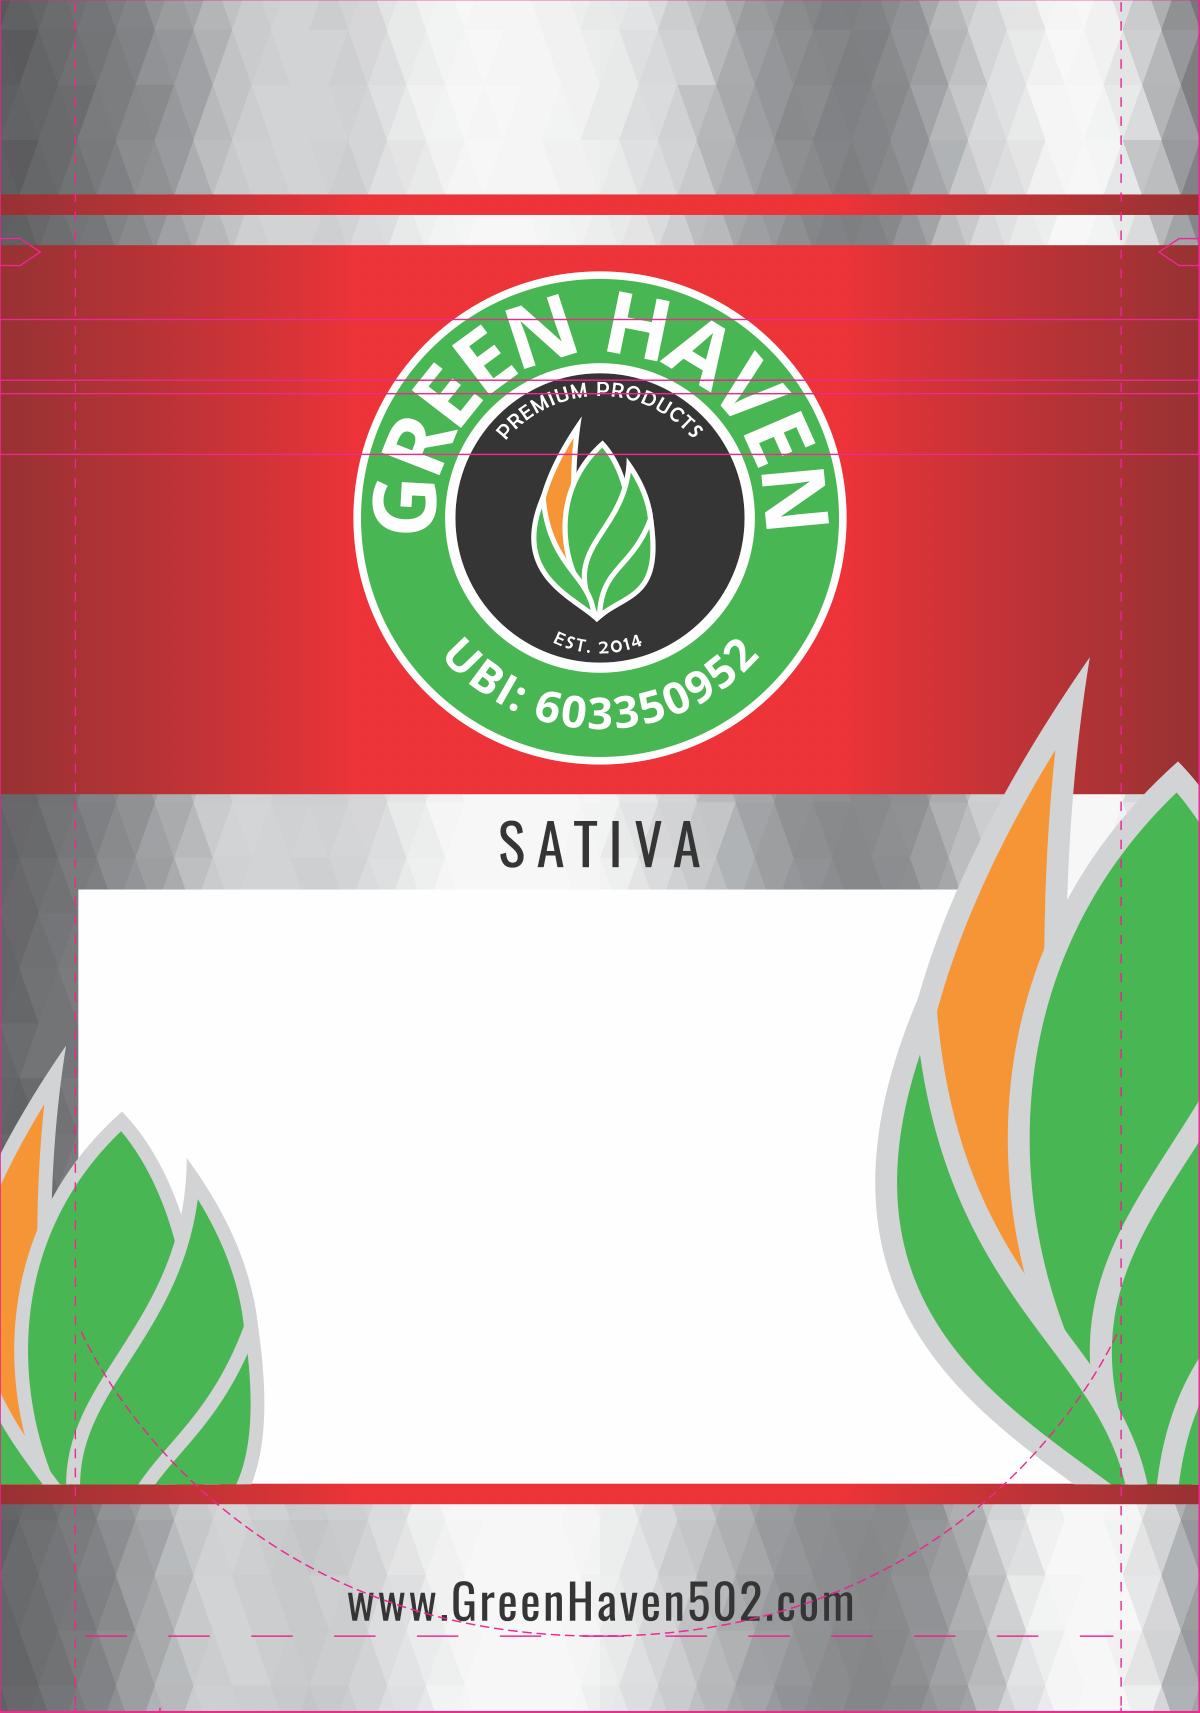 3.5x5 Green Haven Bag Design